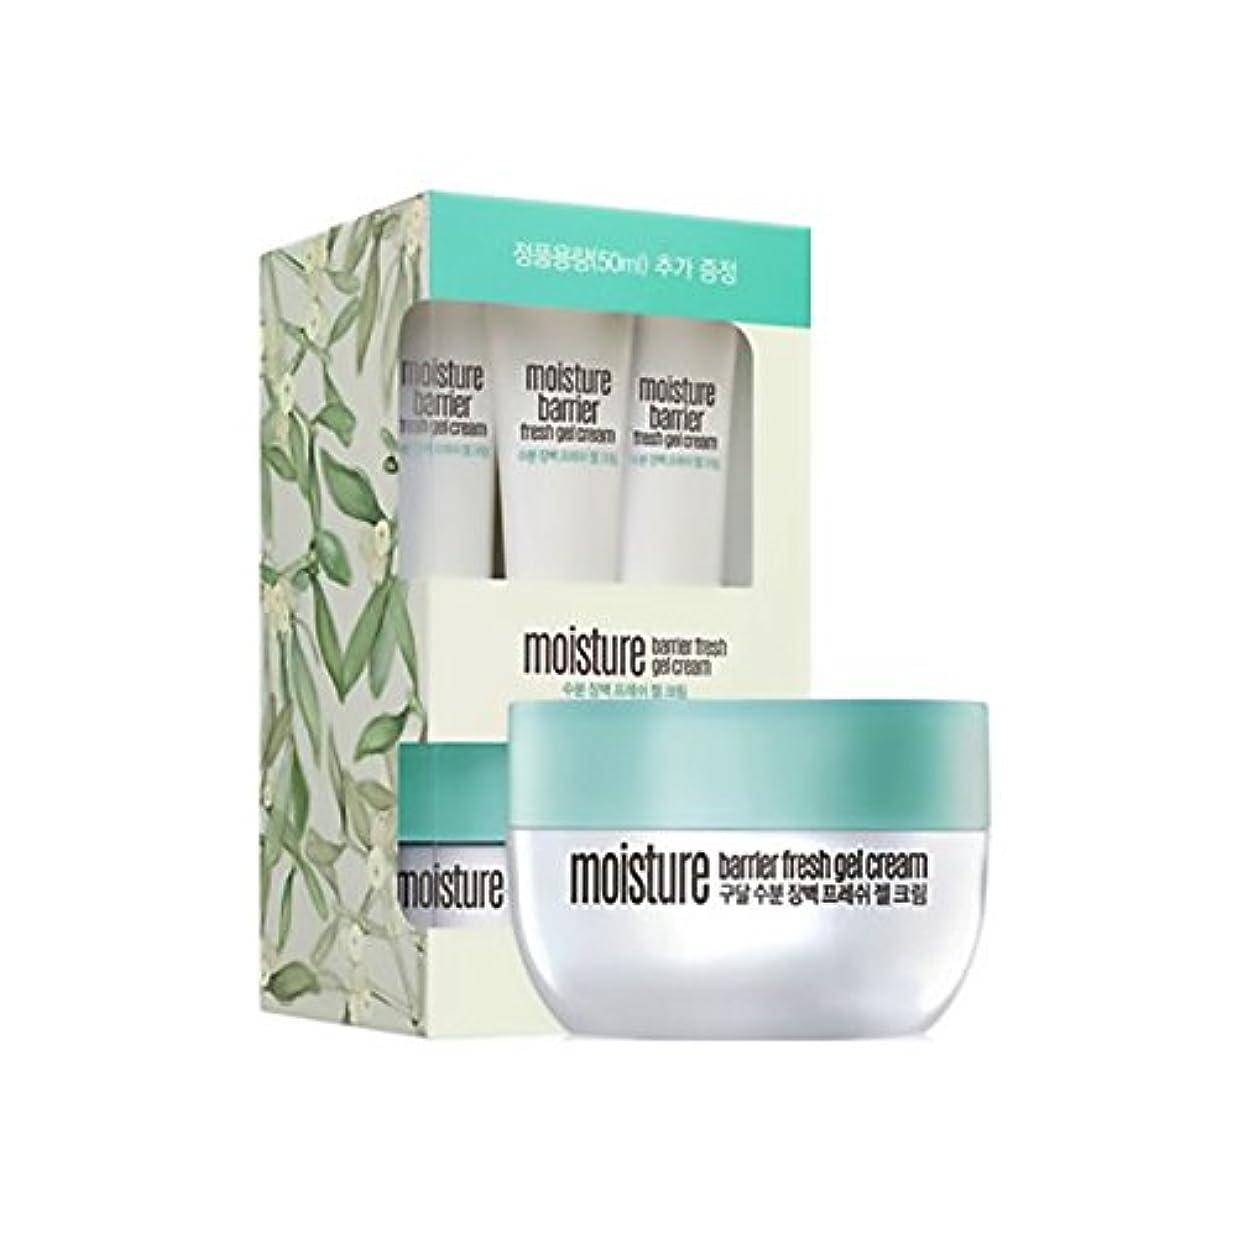 帝国数字版goodal moisture barrier fresh gel cream set